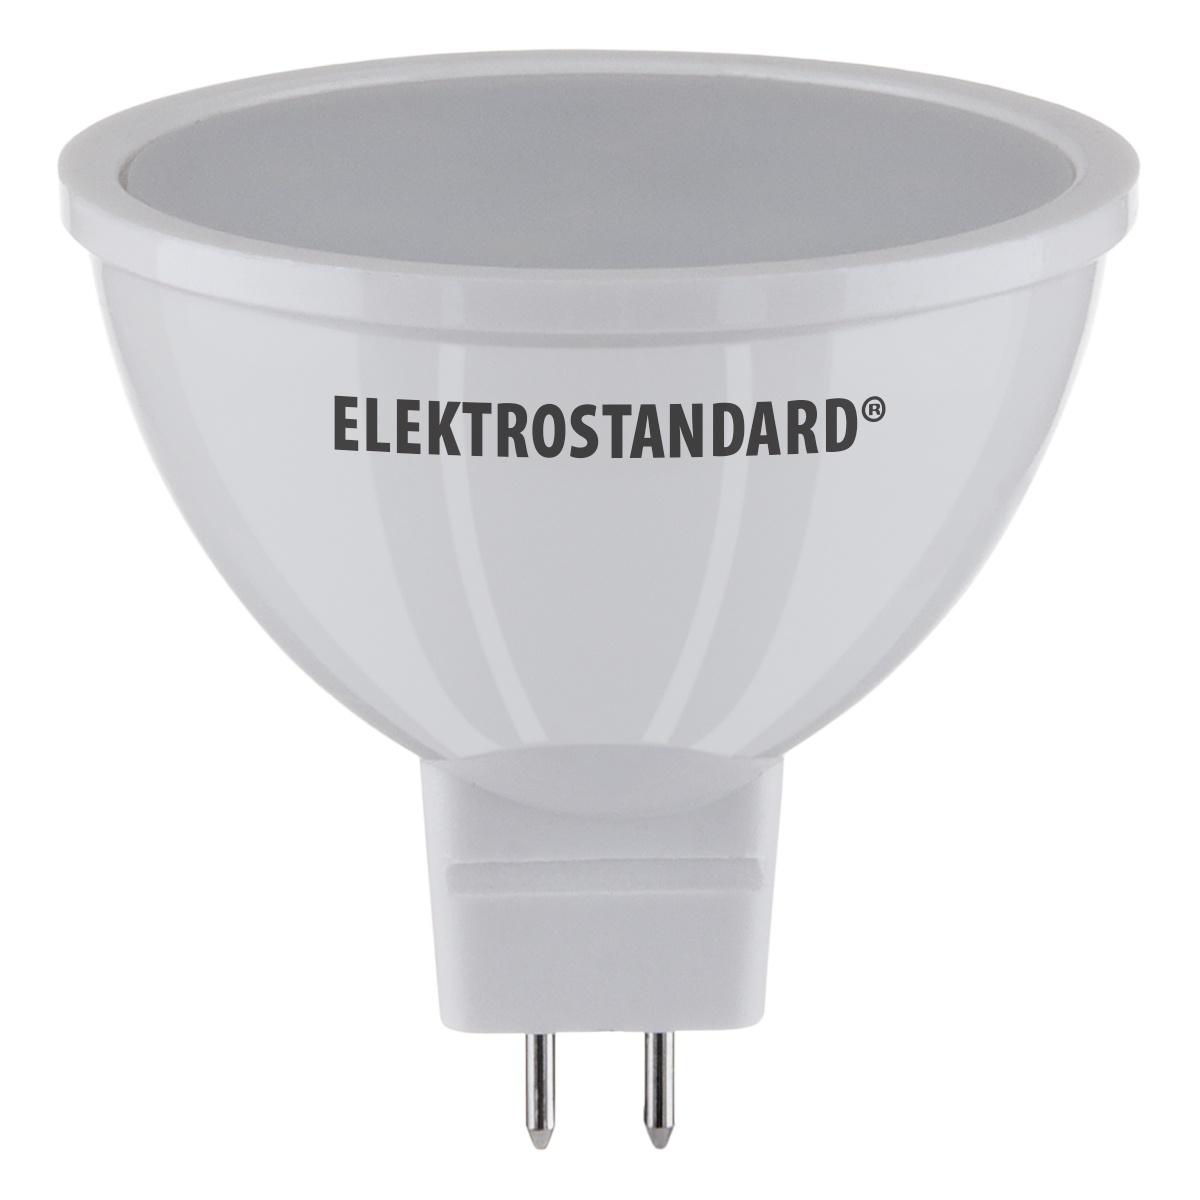 Лампочка Elektrostandard светодиодная JCDR01 5W 220V 3300K, Теплый свет 5 Вт, Светодиодная лампочка philips теплый свет 14 5 вт светодиодная